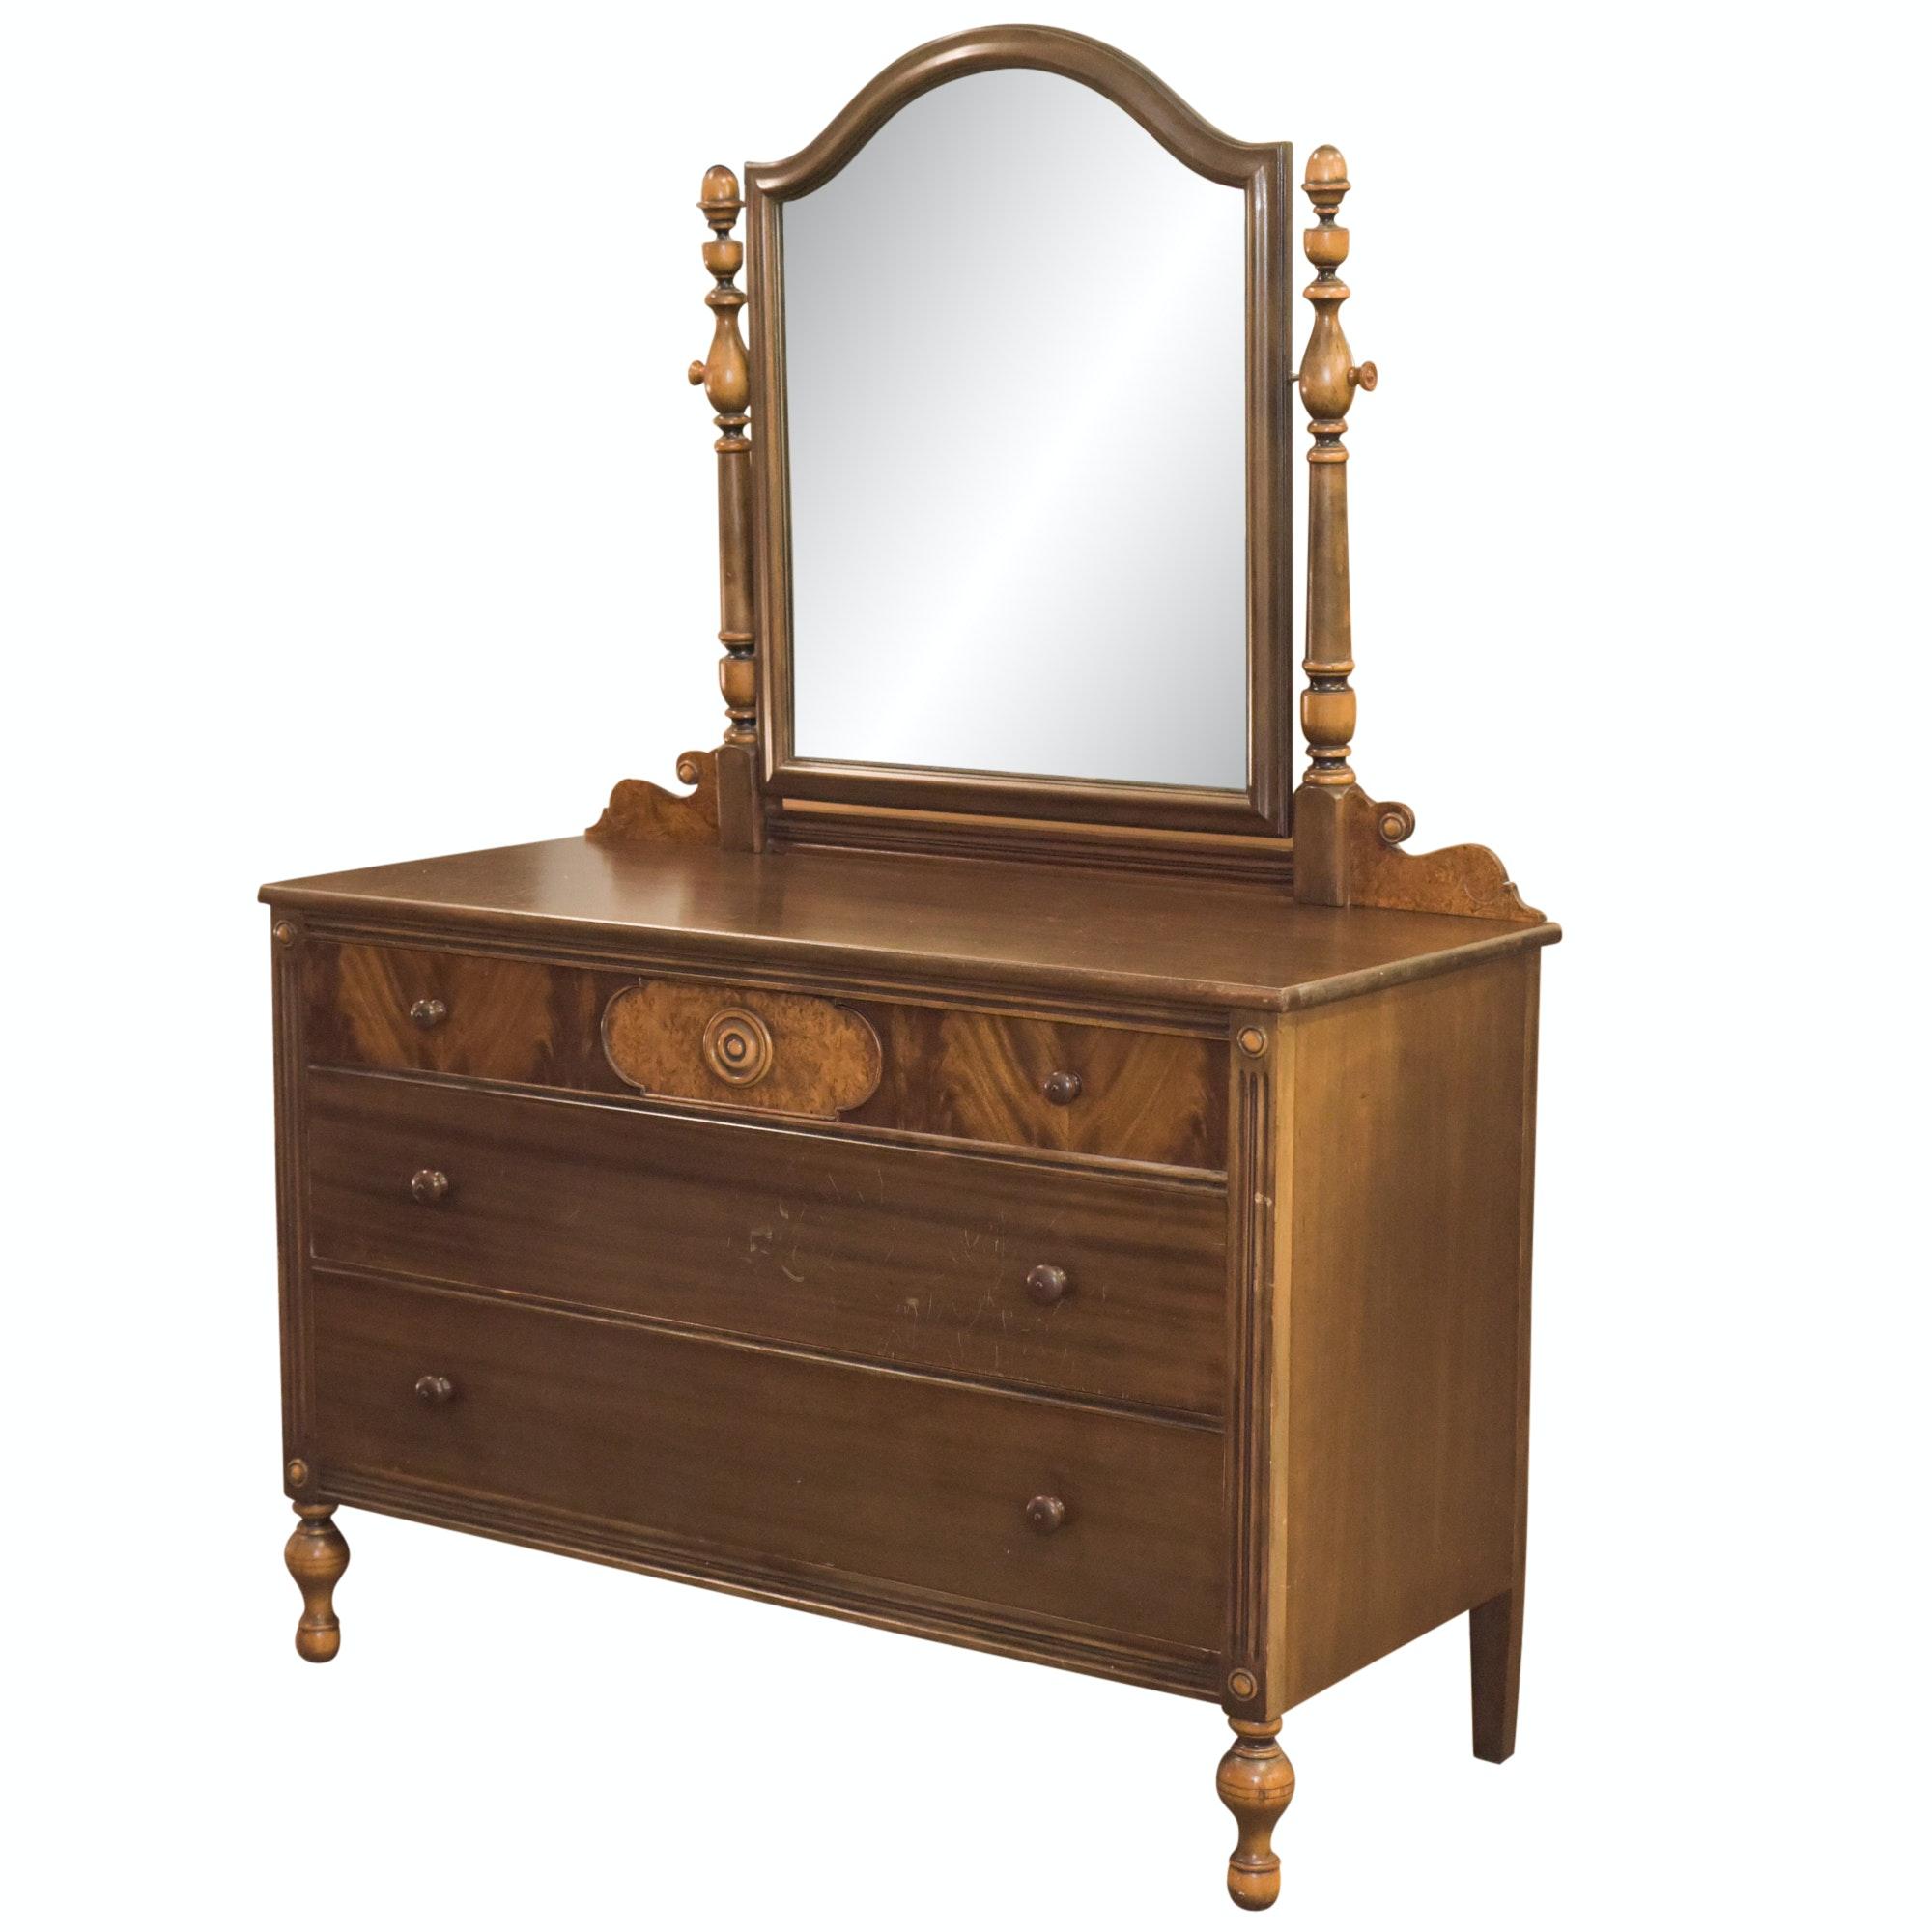 Vintage Victorian Style Burl Wood Veneer Dresser and Mirror by Paine Furniture